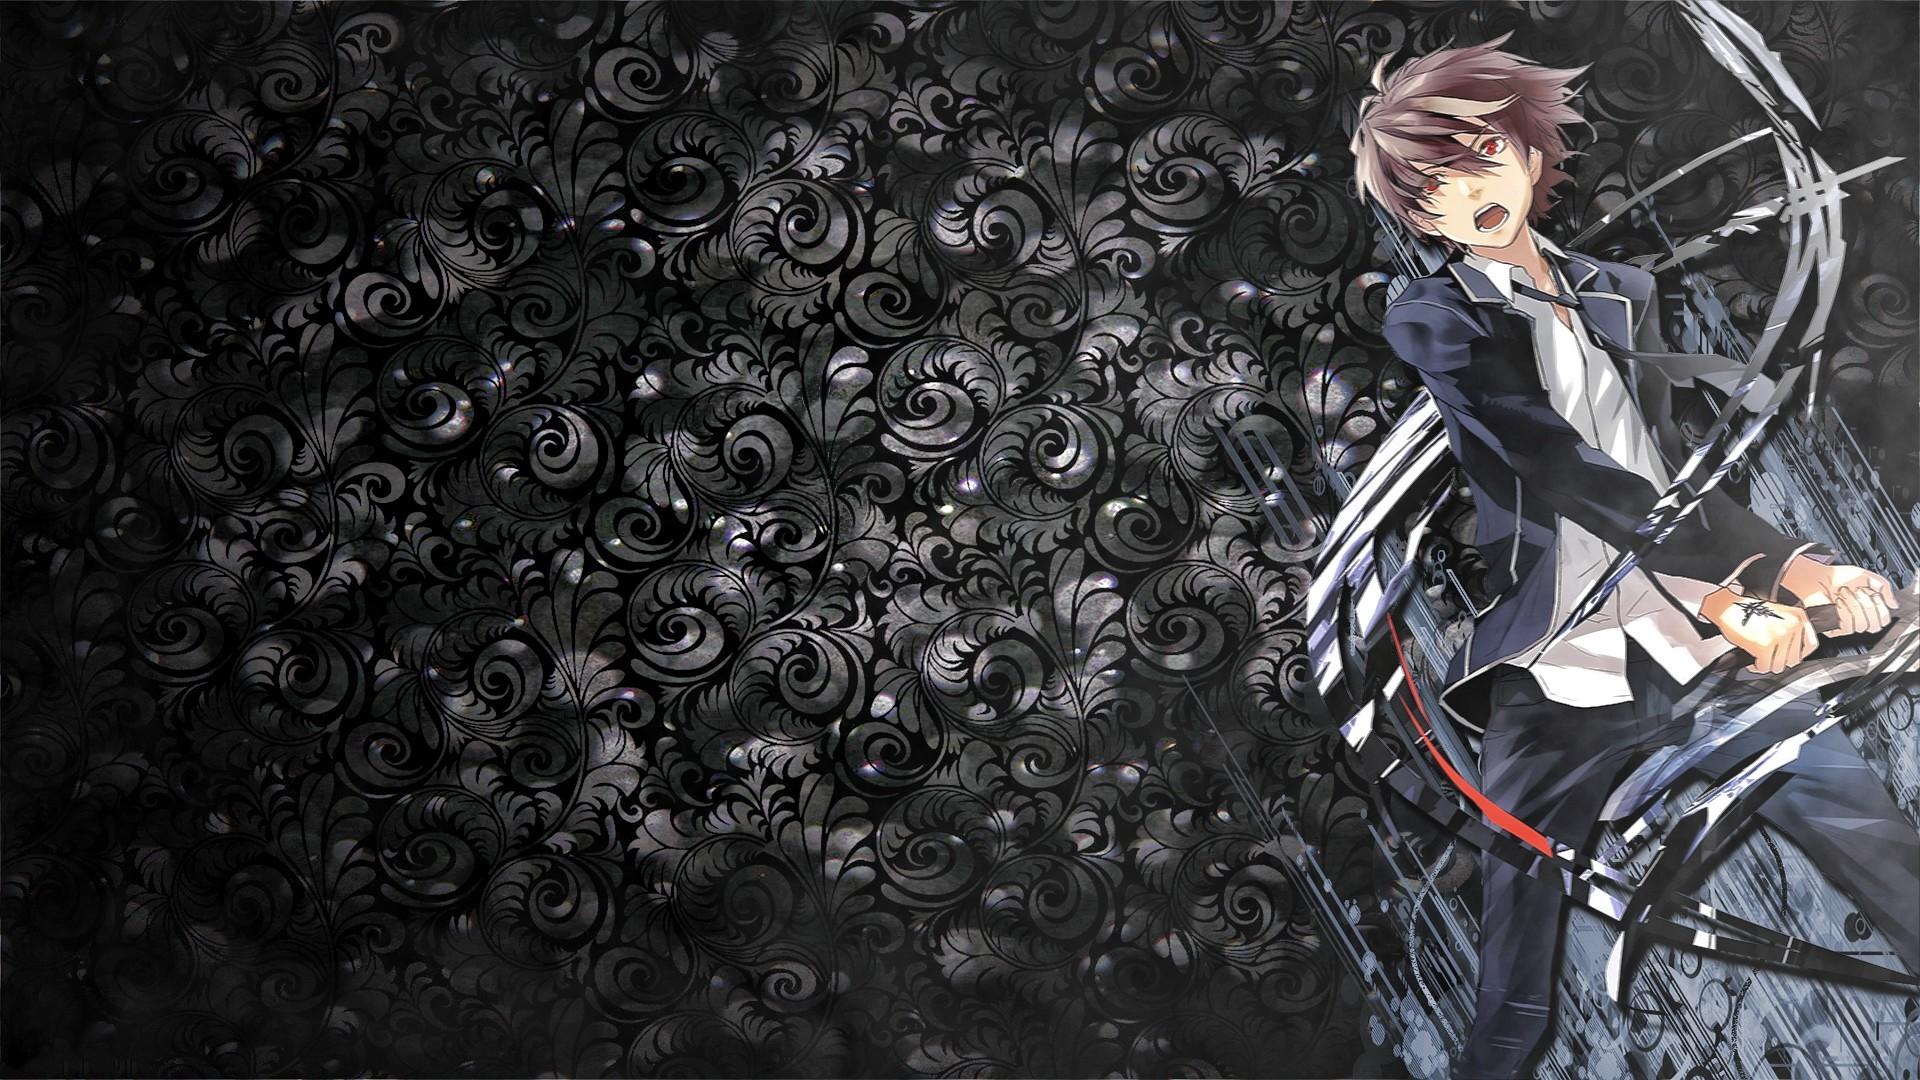 anime boy background full hd download desktop wallpapers hd images  background images free 4k tablet smart